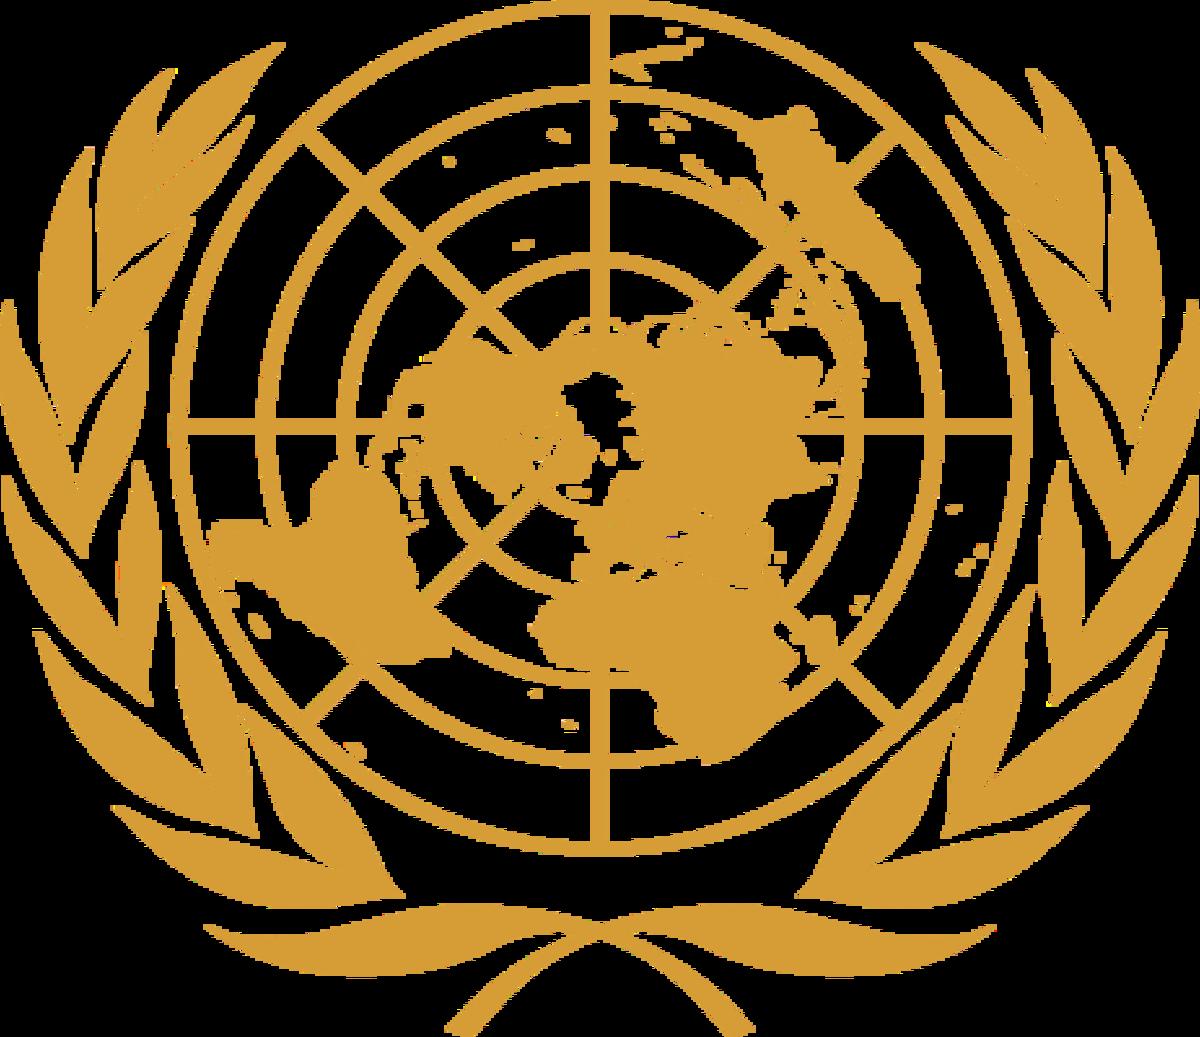 United Nations Emblem (Public Domain)